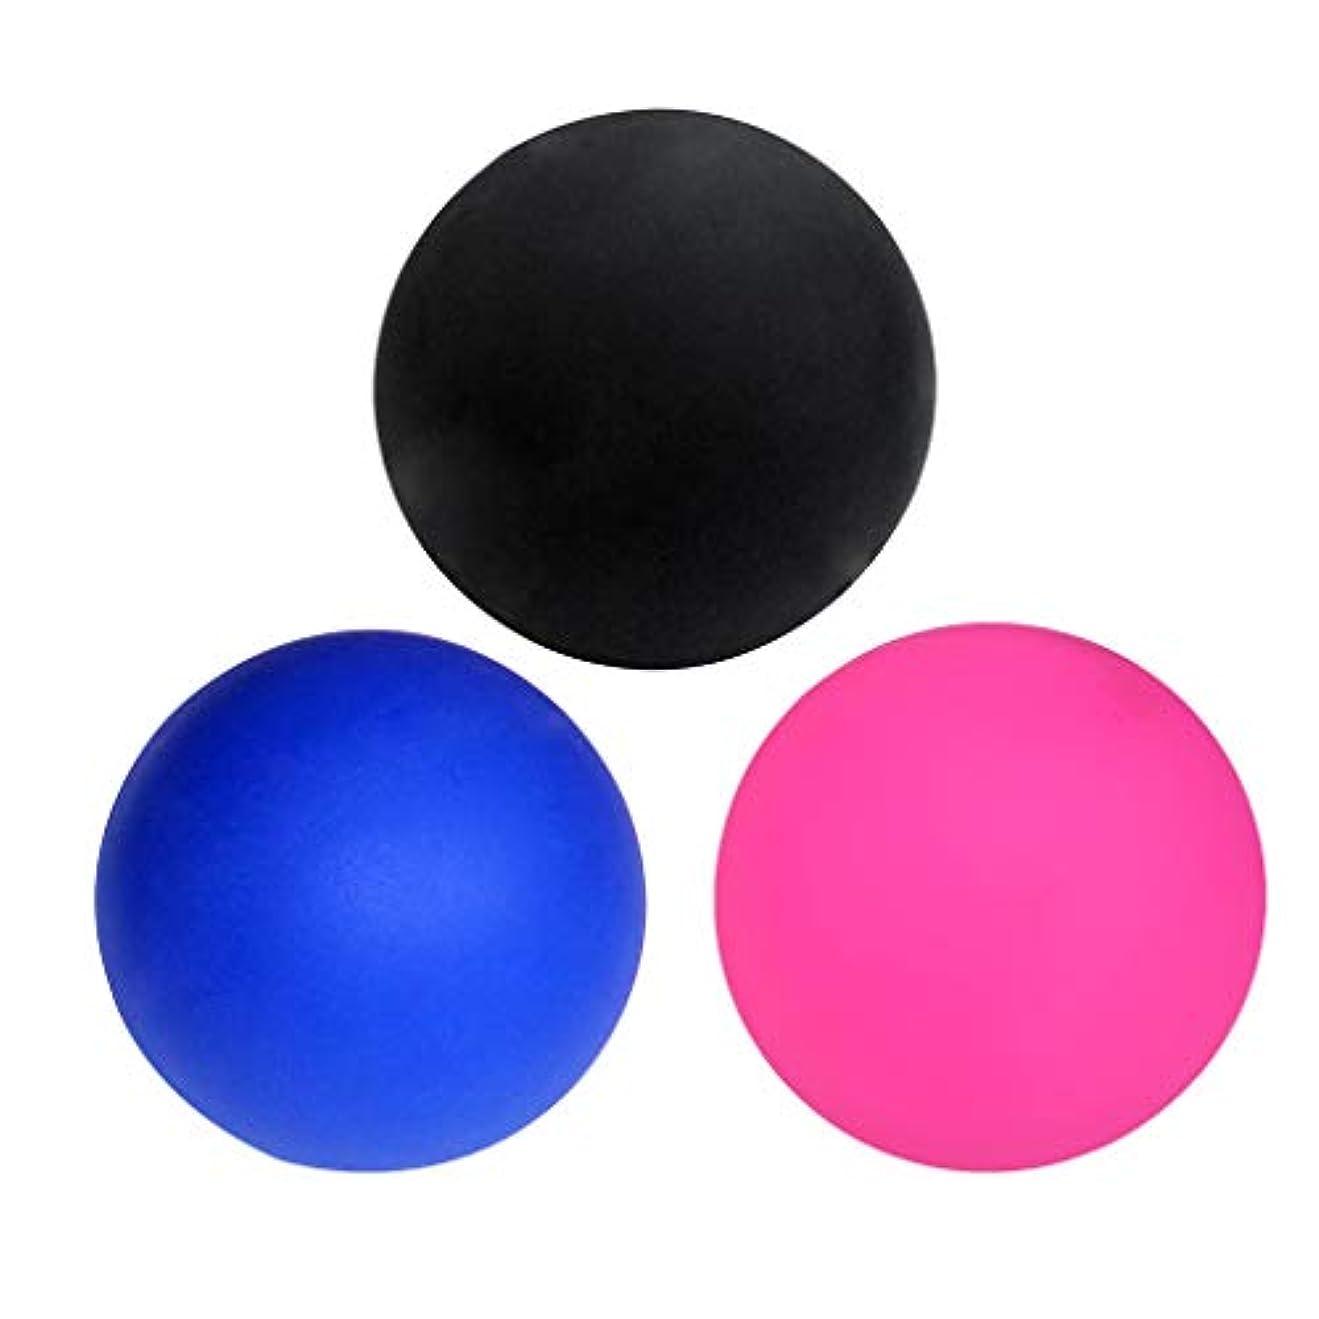 dailymall マッサージボール ラクロスボール トリガーポイント 筋膜リリース トレーニング ツボ押しグッズ 3個入